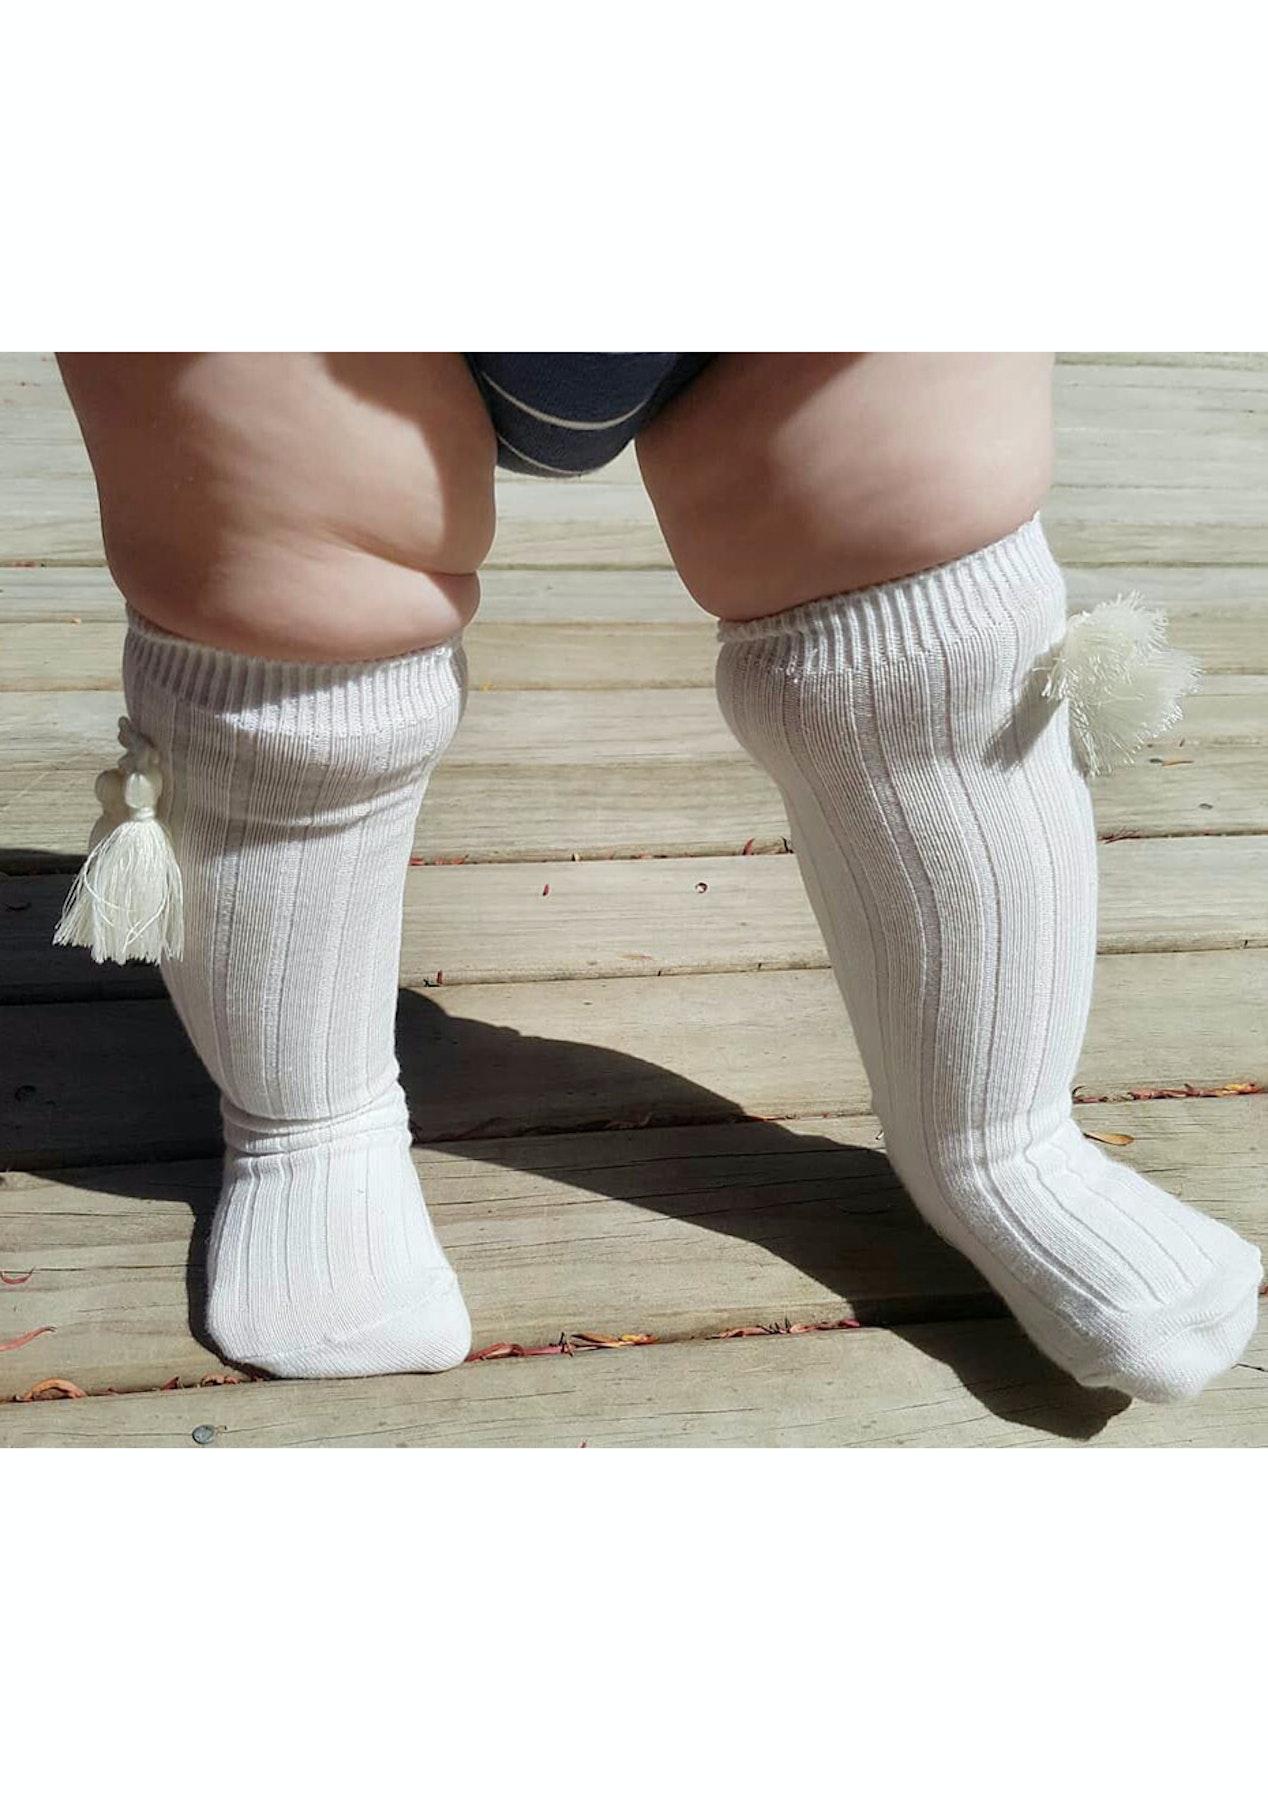 44acd97cb Tassel Socks White   Cream- 2 Pack Bundle - Baby Shower and Nursery Sale -  Onceit